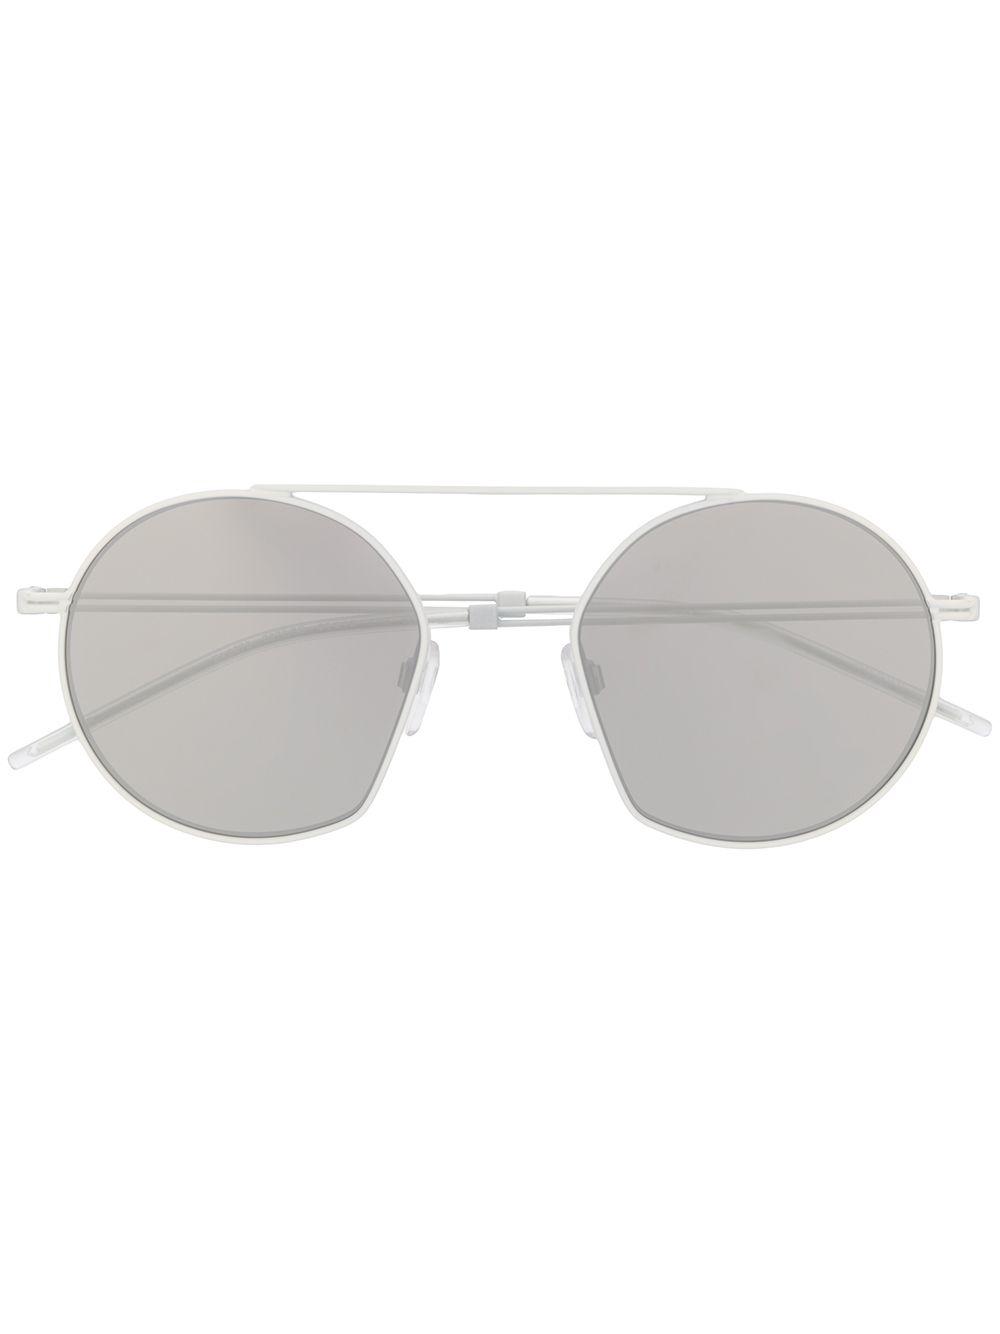 Emporio Armani   солнцезащитные очки G50 в круглой оправе   Clouty